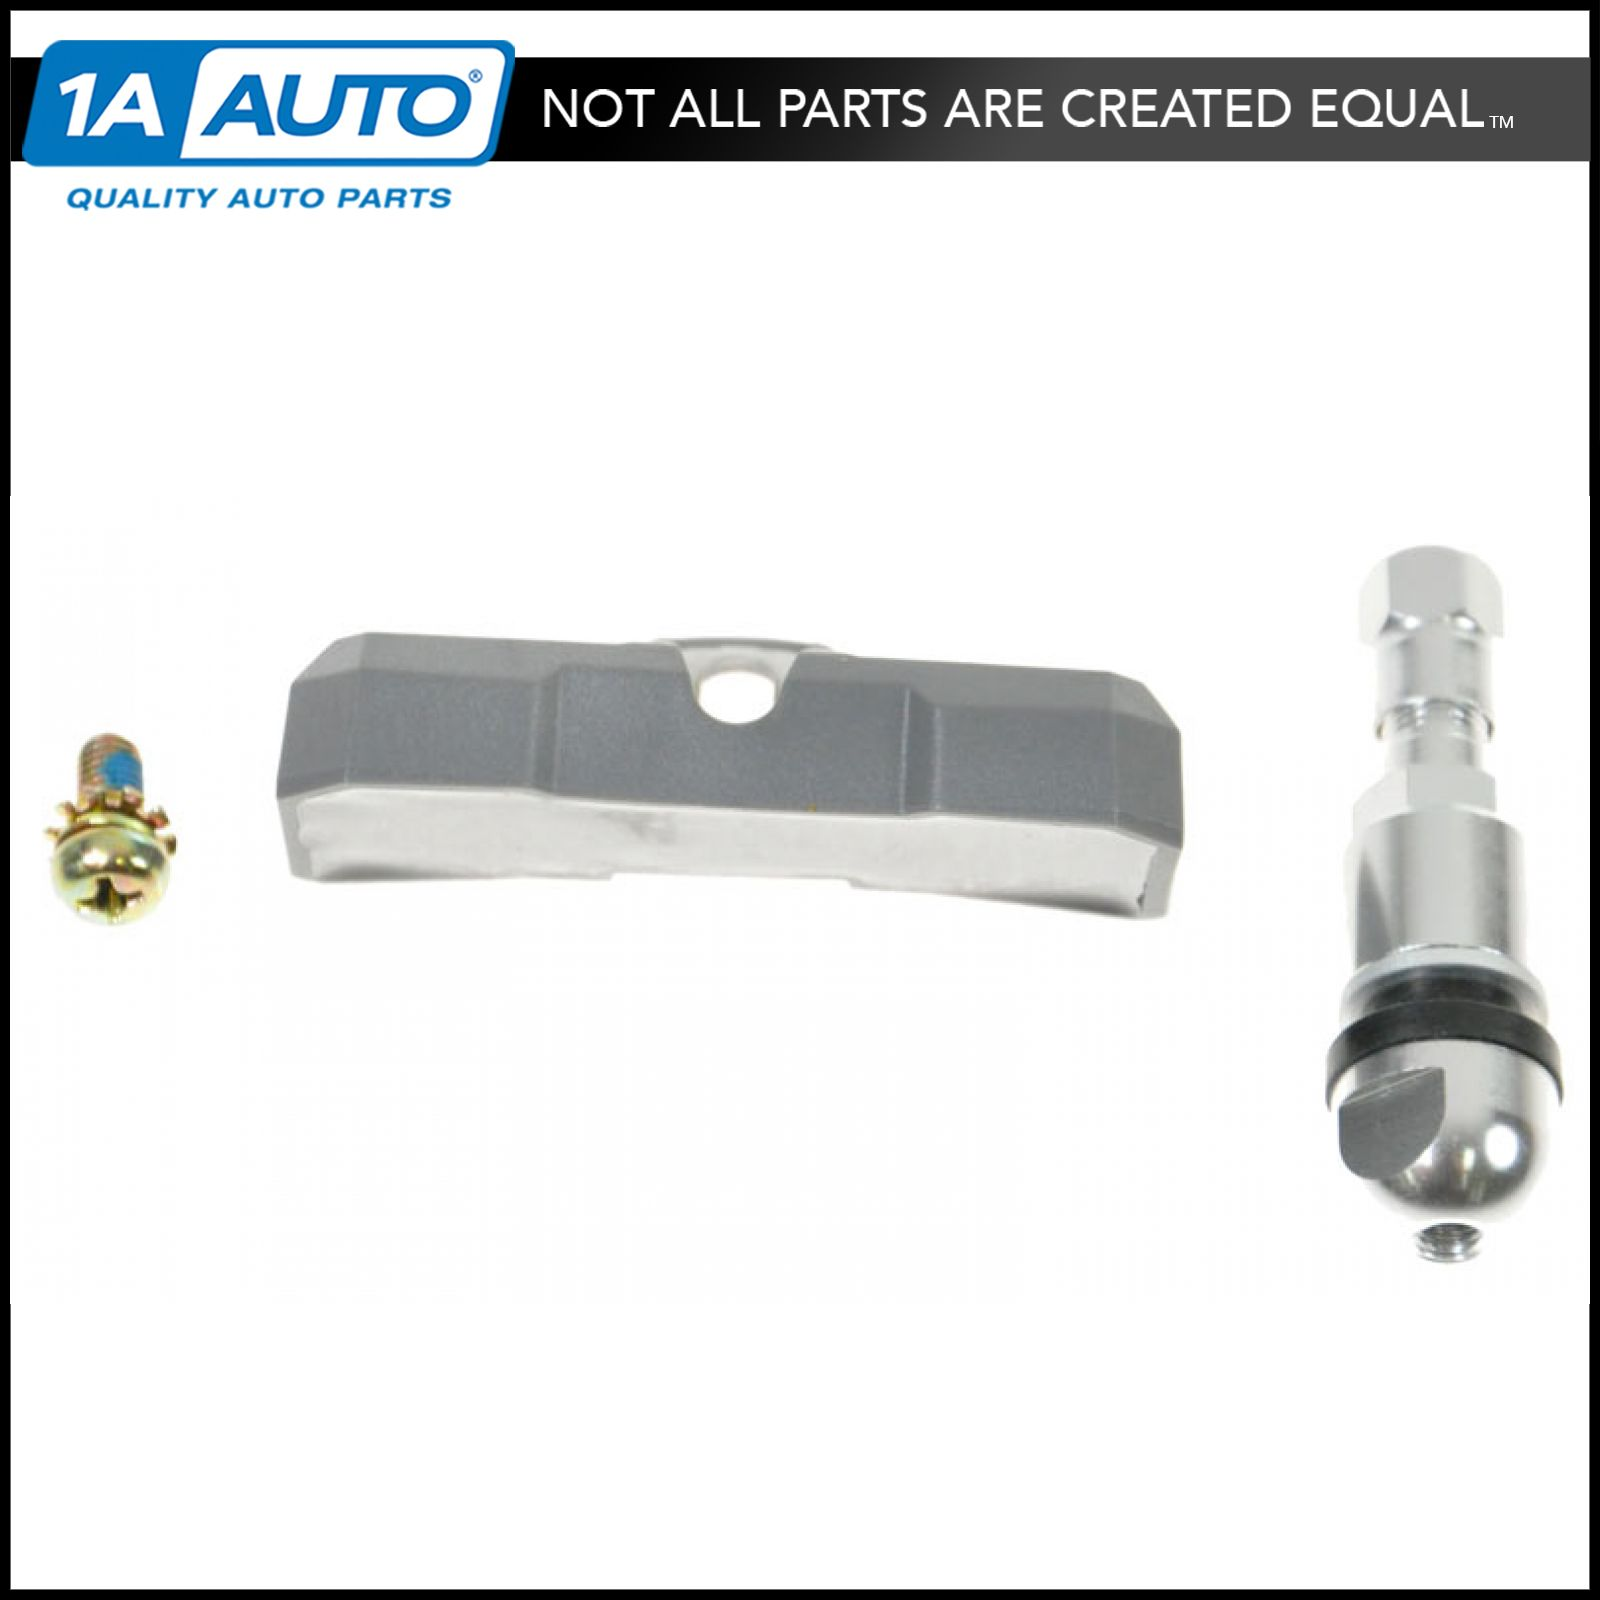 Dorman TPMS System Tire Pressure Monitor Sensor For Honda